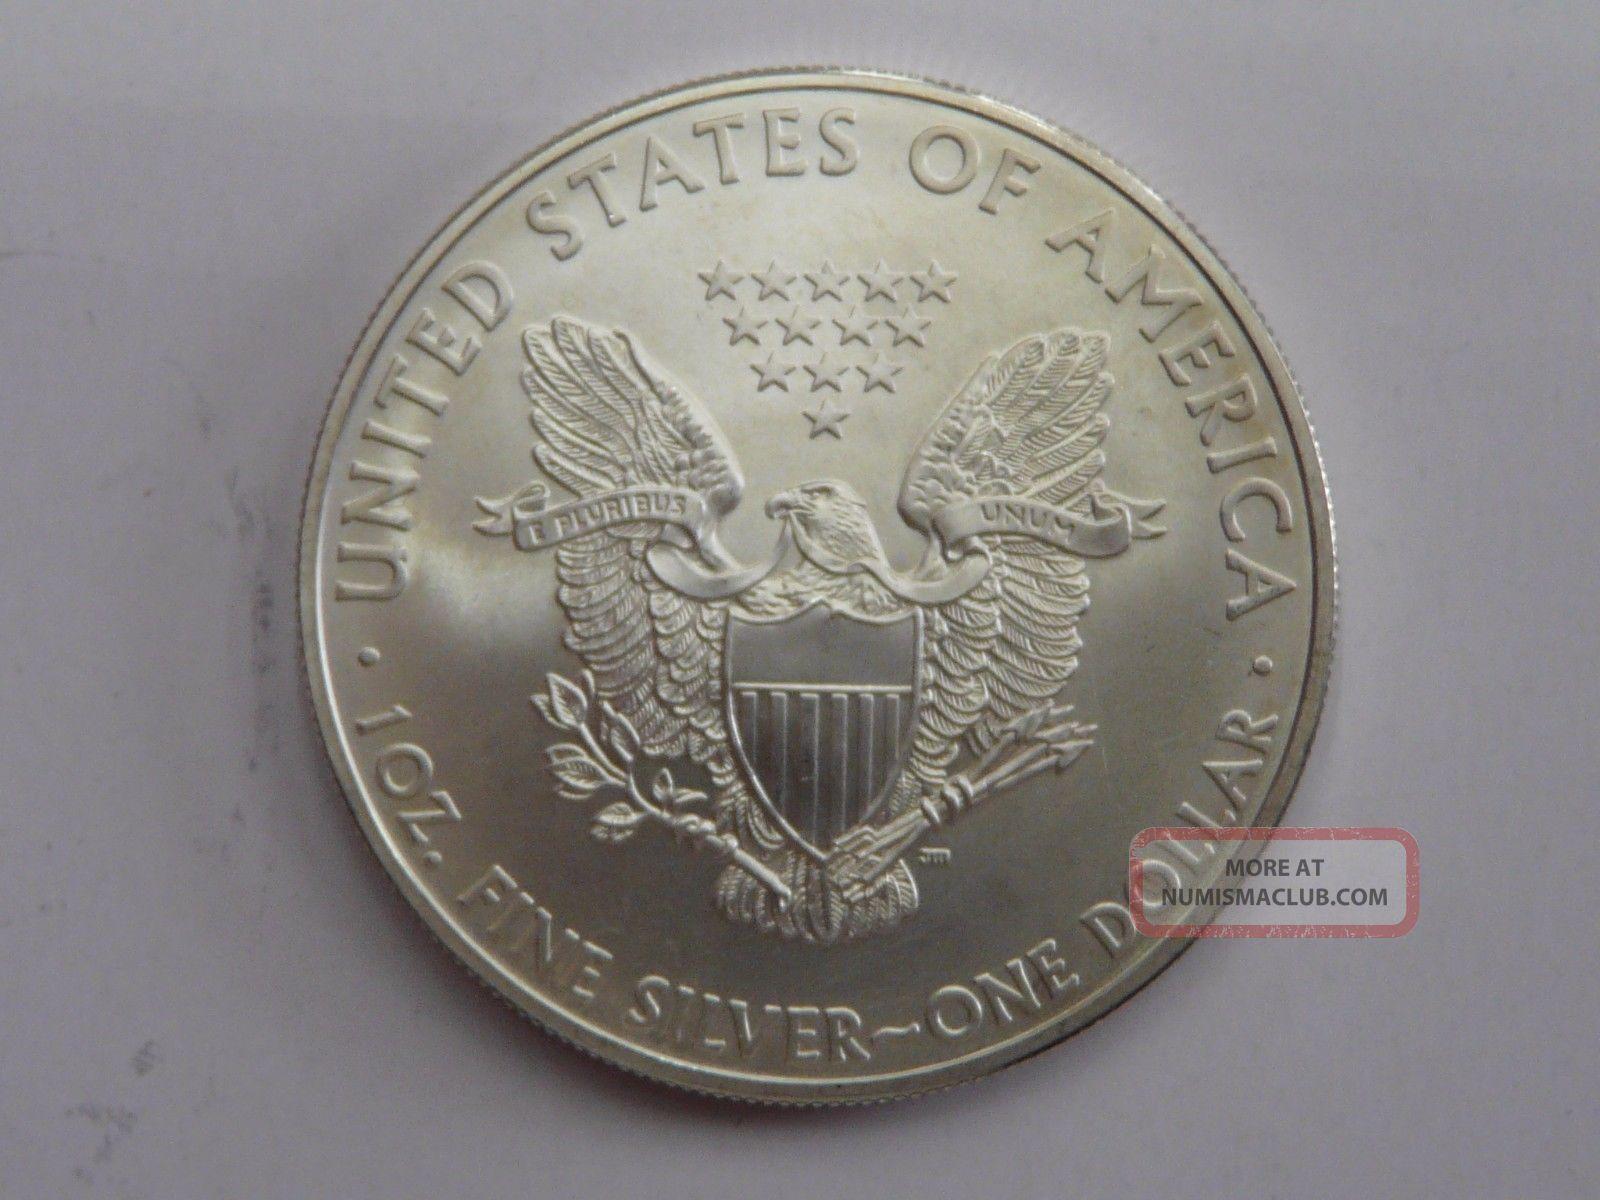 2008 American Eagle Walking Liberty 1 Oz Fine Silver